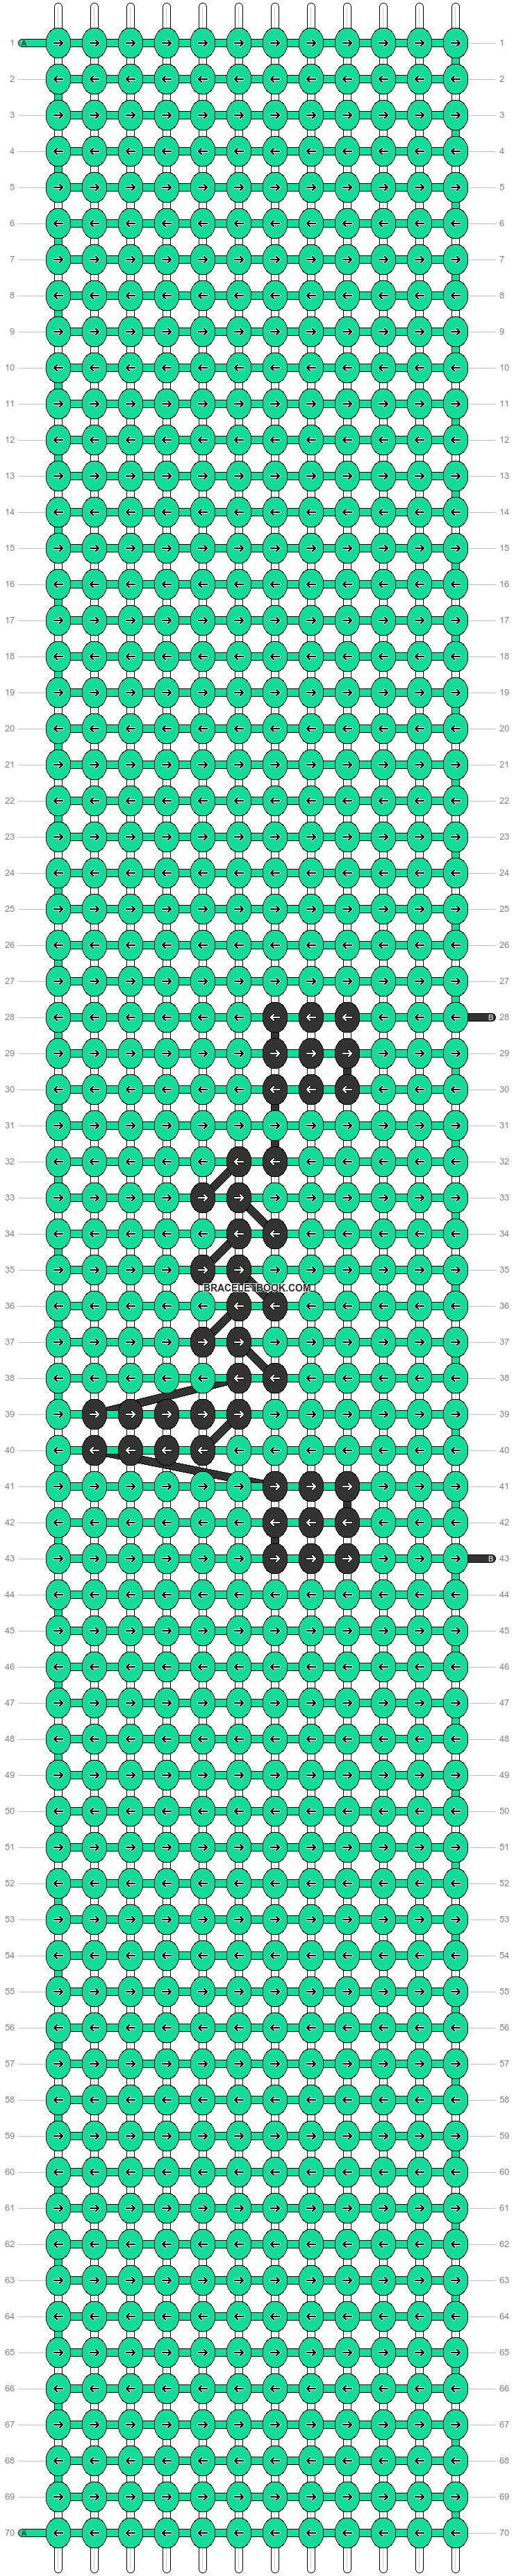 Alpha pattern #45876 pattern